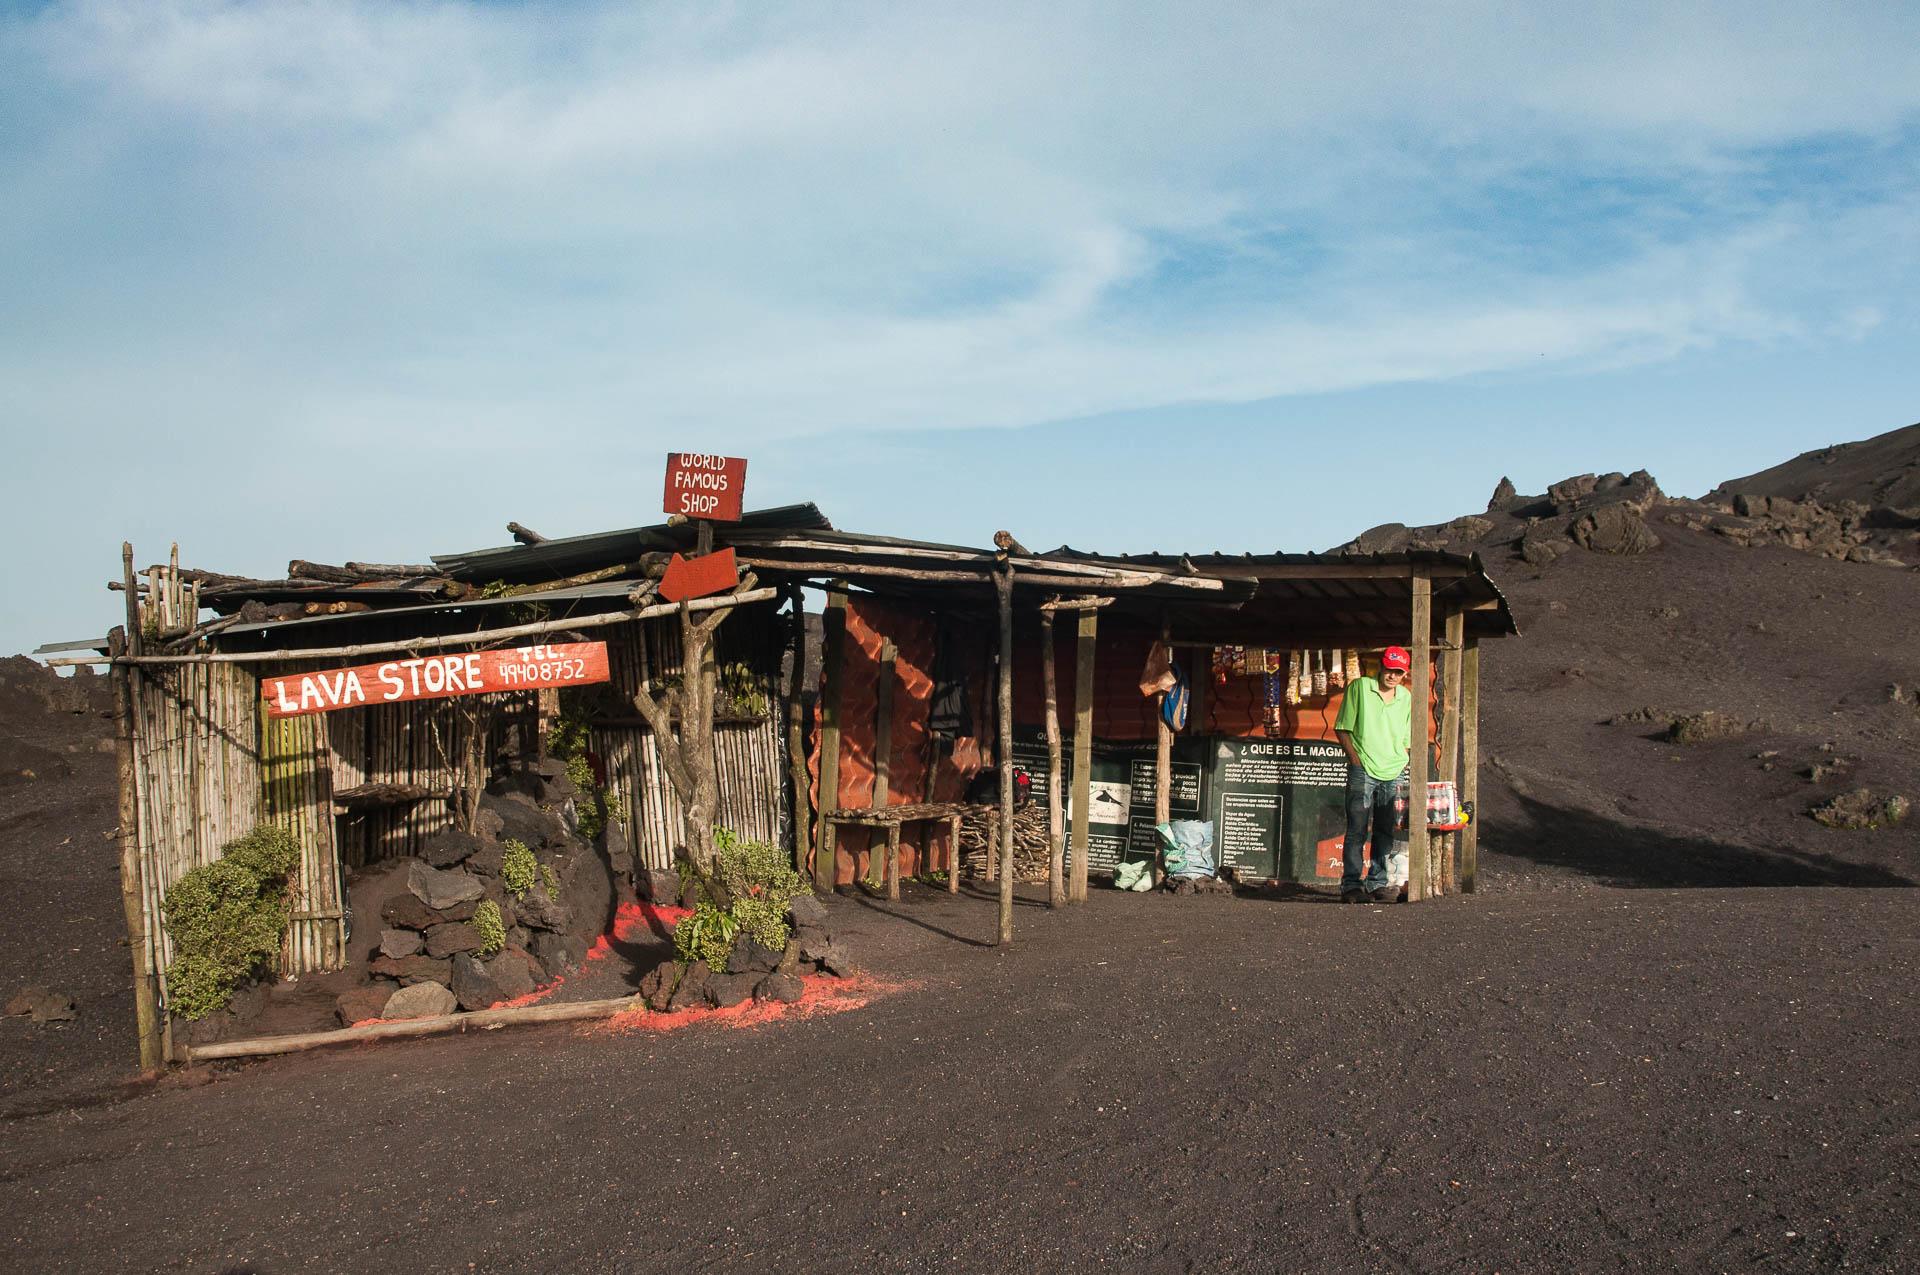 Pacaya volcan boutique - Les globe blogueurs - blog voyage nature